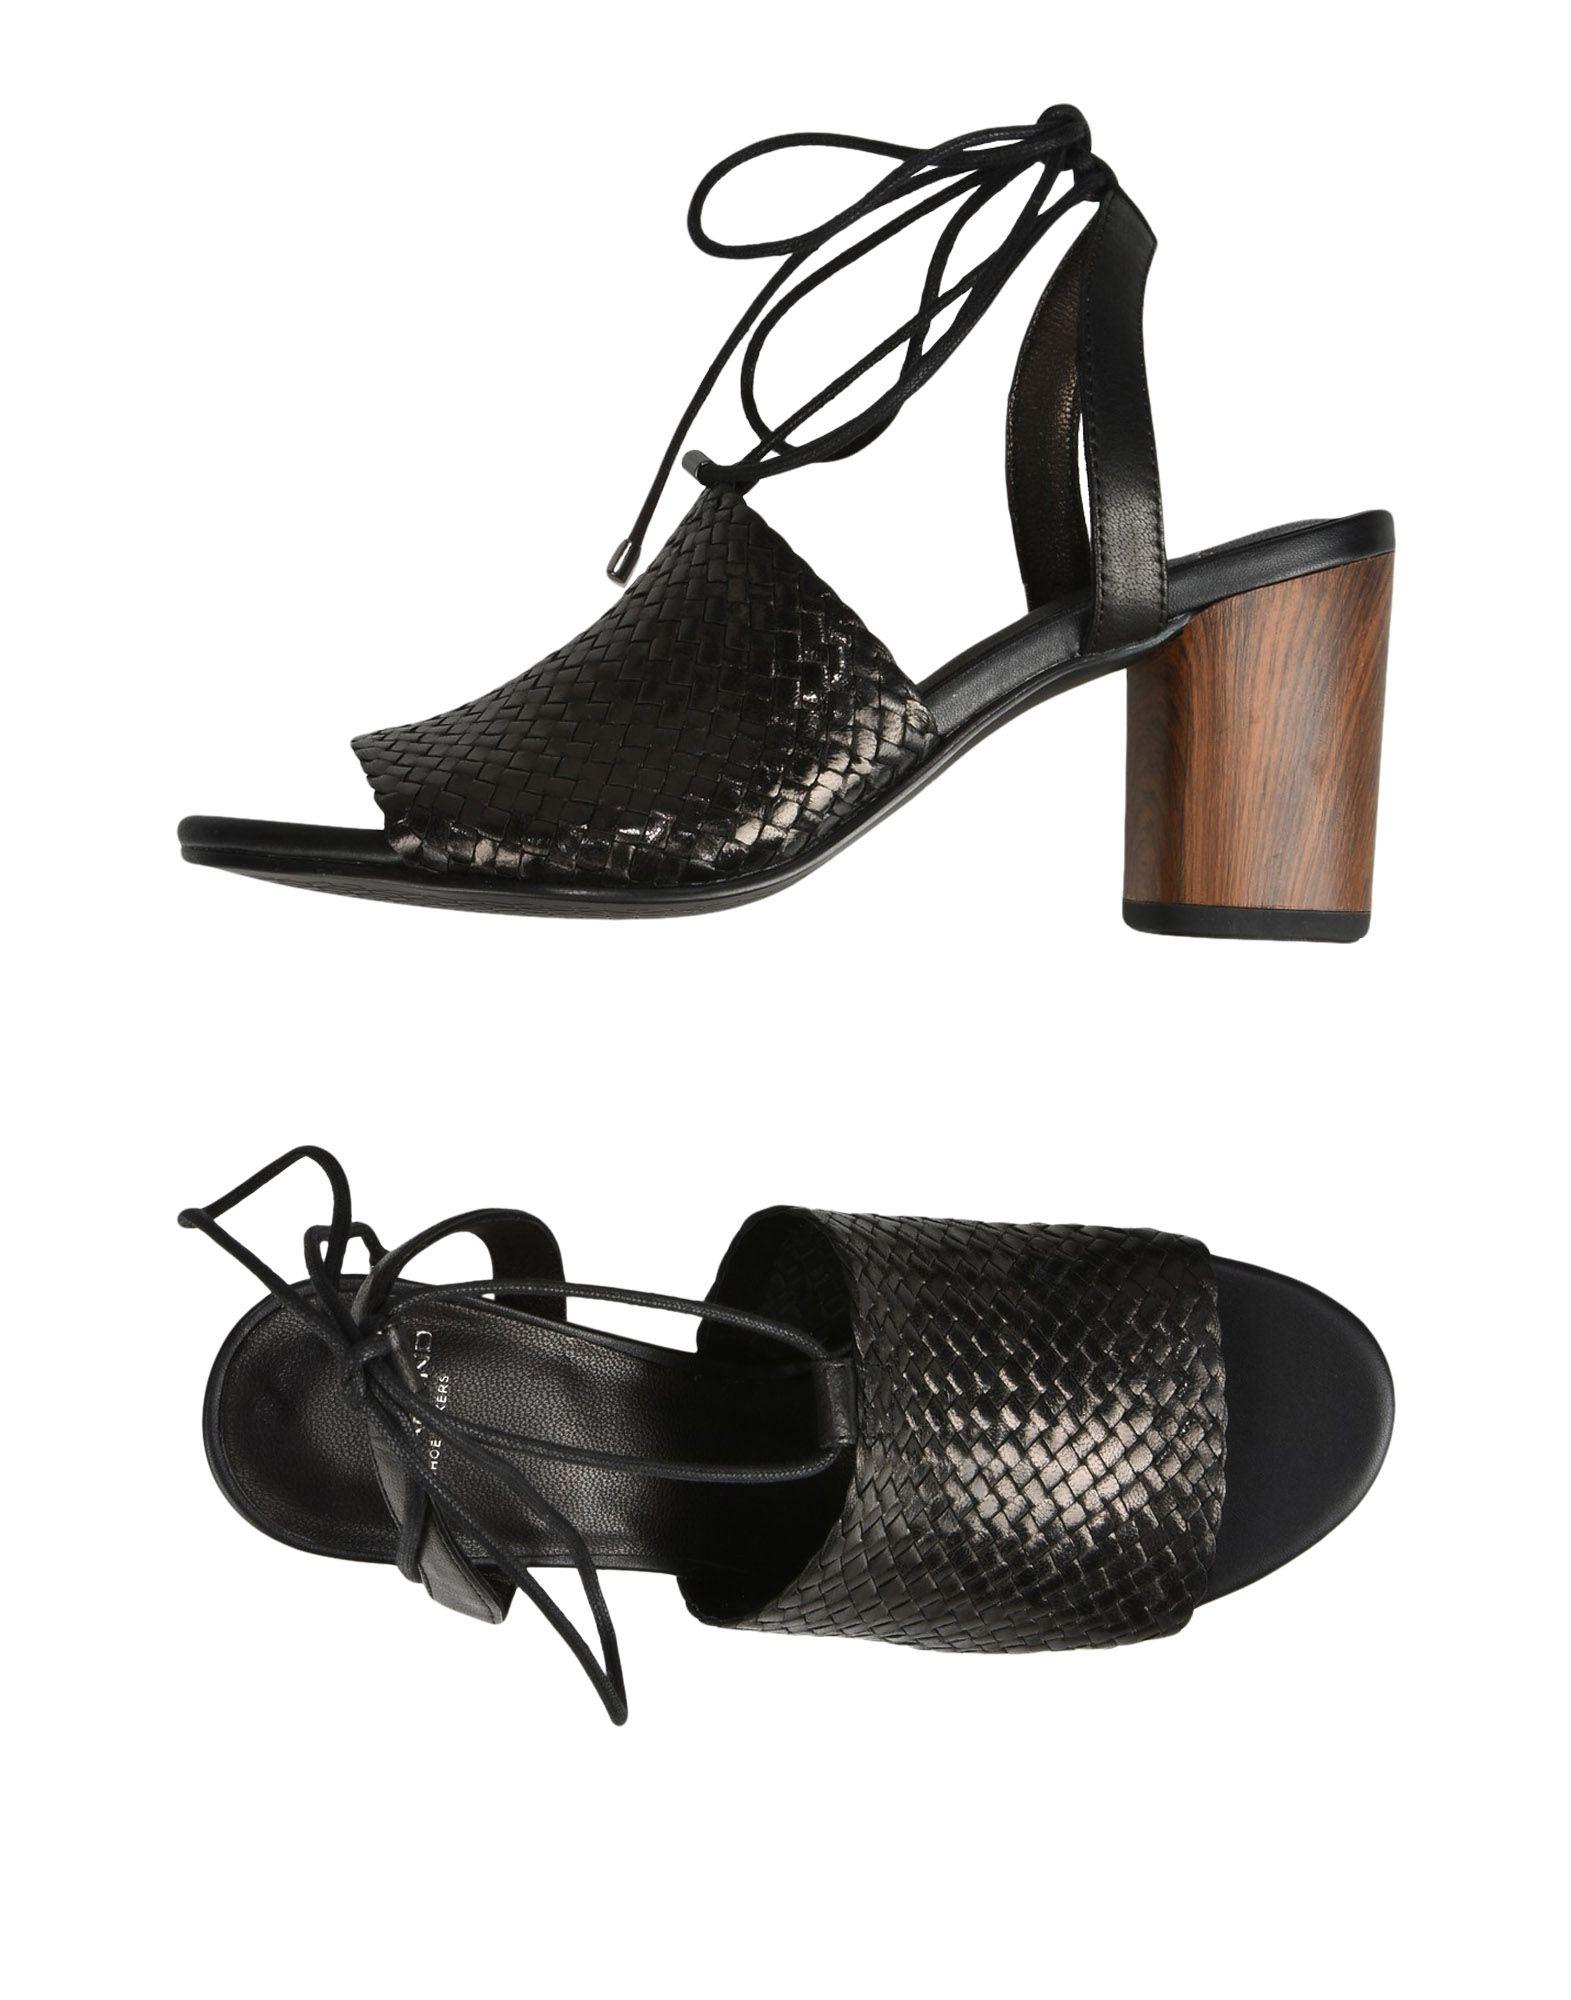 Vagabond Vagabond Vagabond Shoemakers Sandals - Women Vagabond Shoemakers Sandals online on  United Kingdom - 11507177NU 86e26f